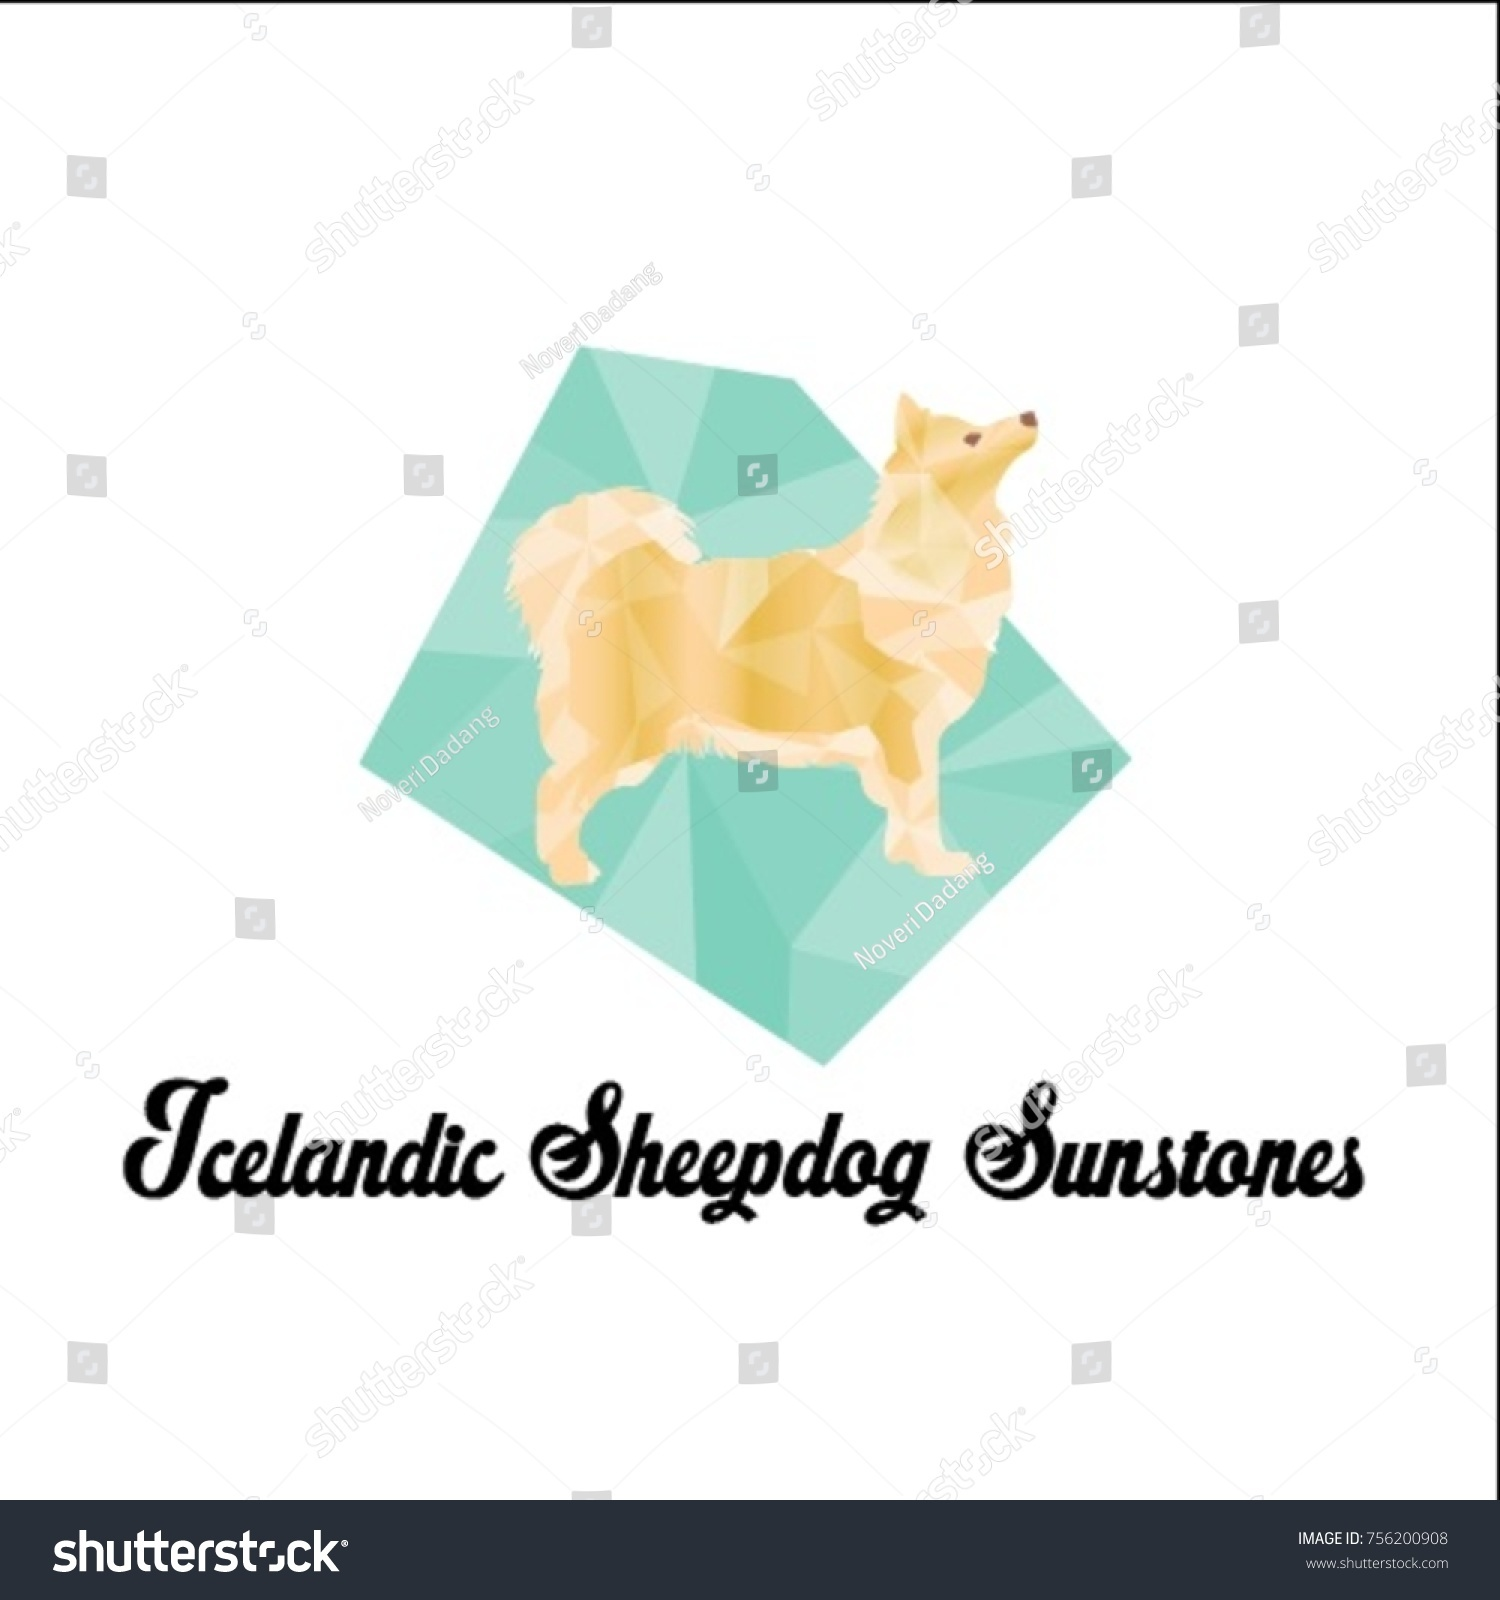 Icelandic Sheepdog Sunstones Stock Vector (Royalty Free) 756200908 ...